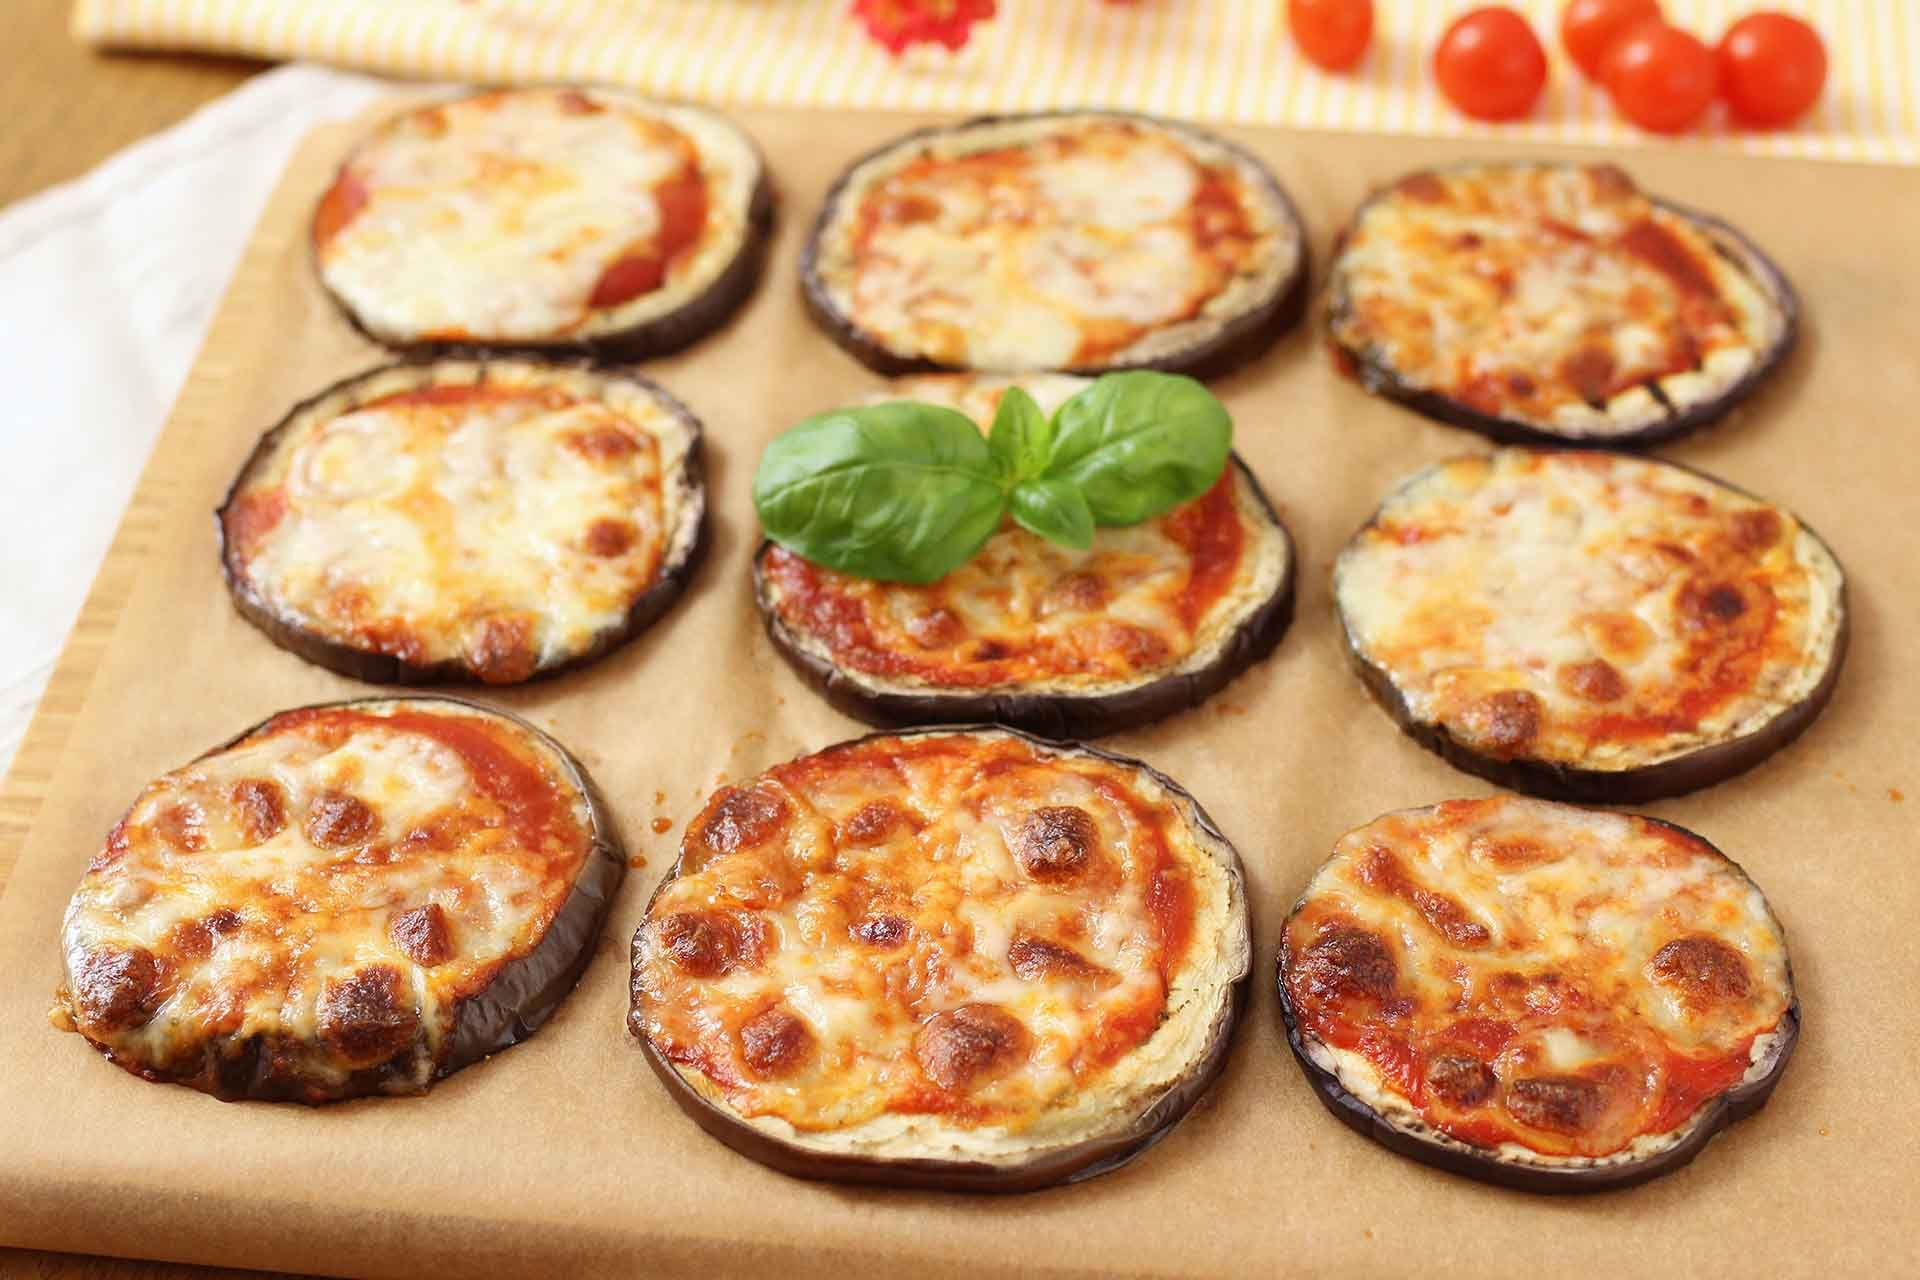 Ricetta Melanzane Benedetta Rossi.Pizzette Di Melanzane Ricette Ricette Di Cucina Ricette Contorni